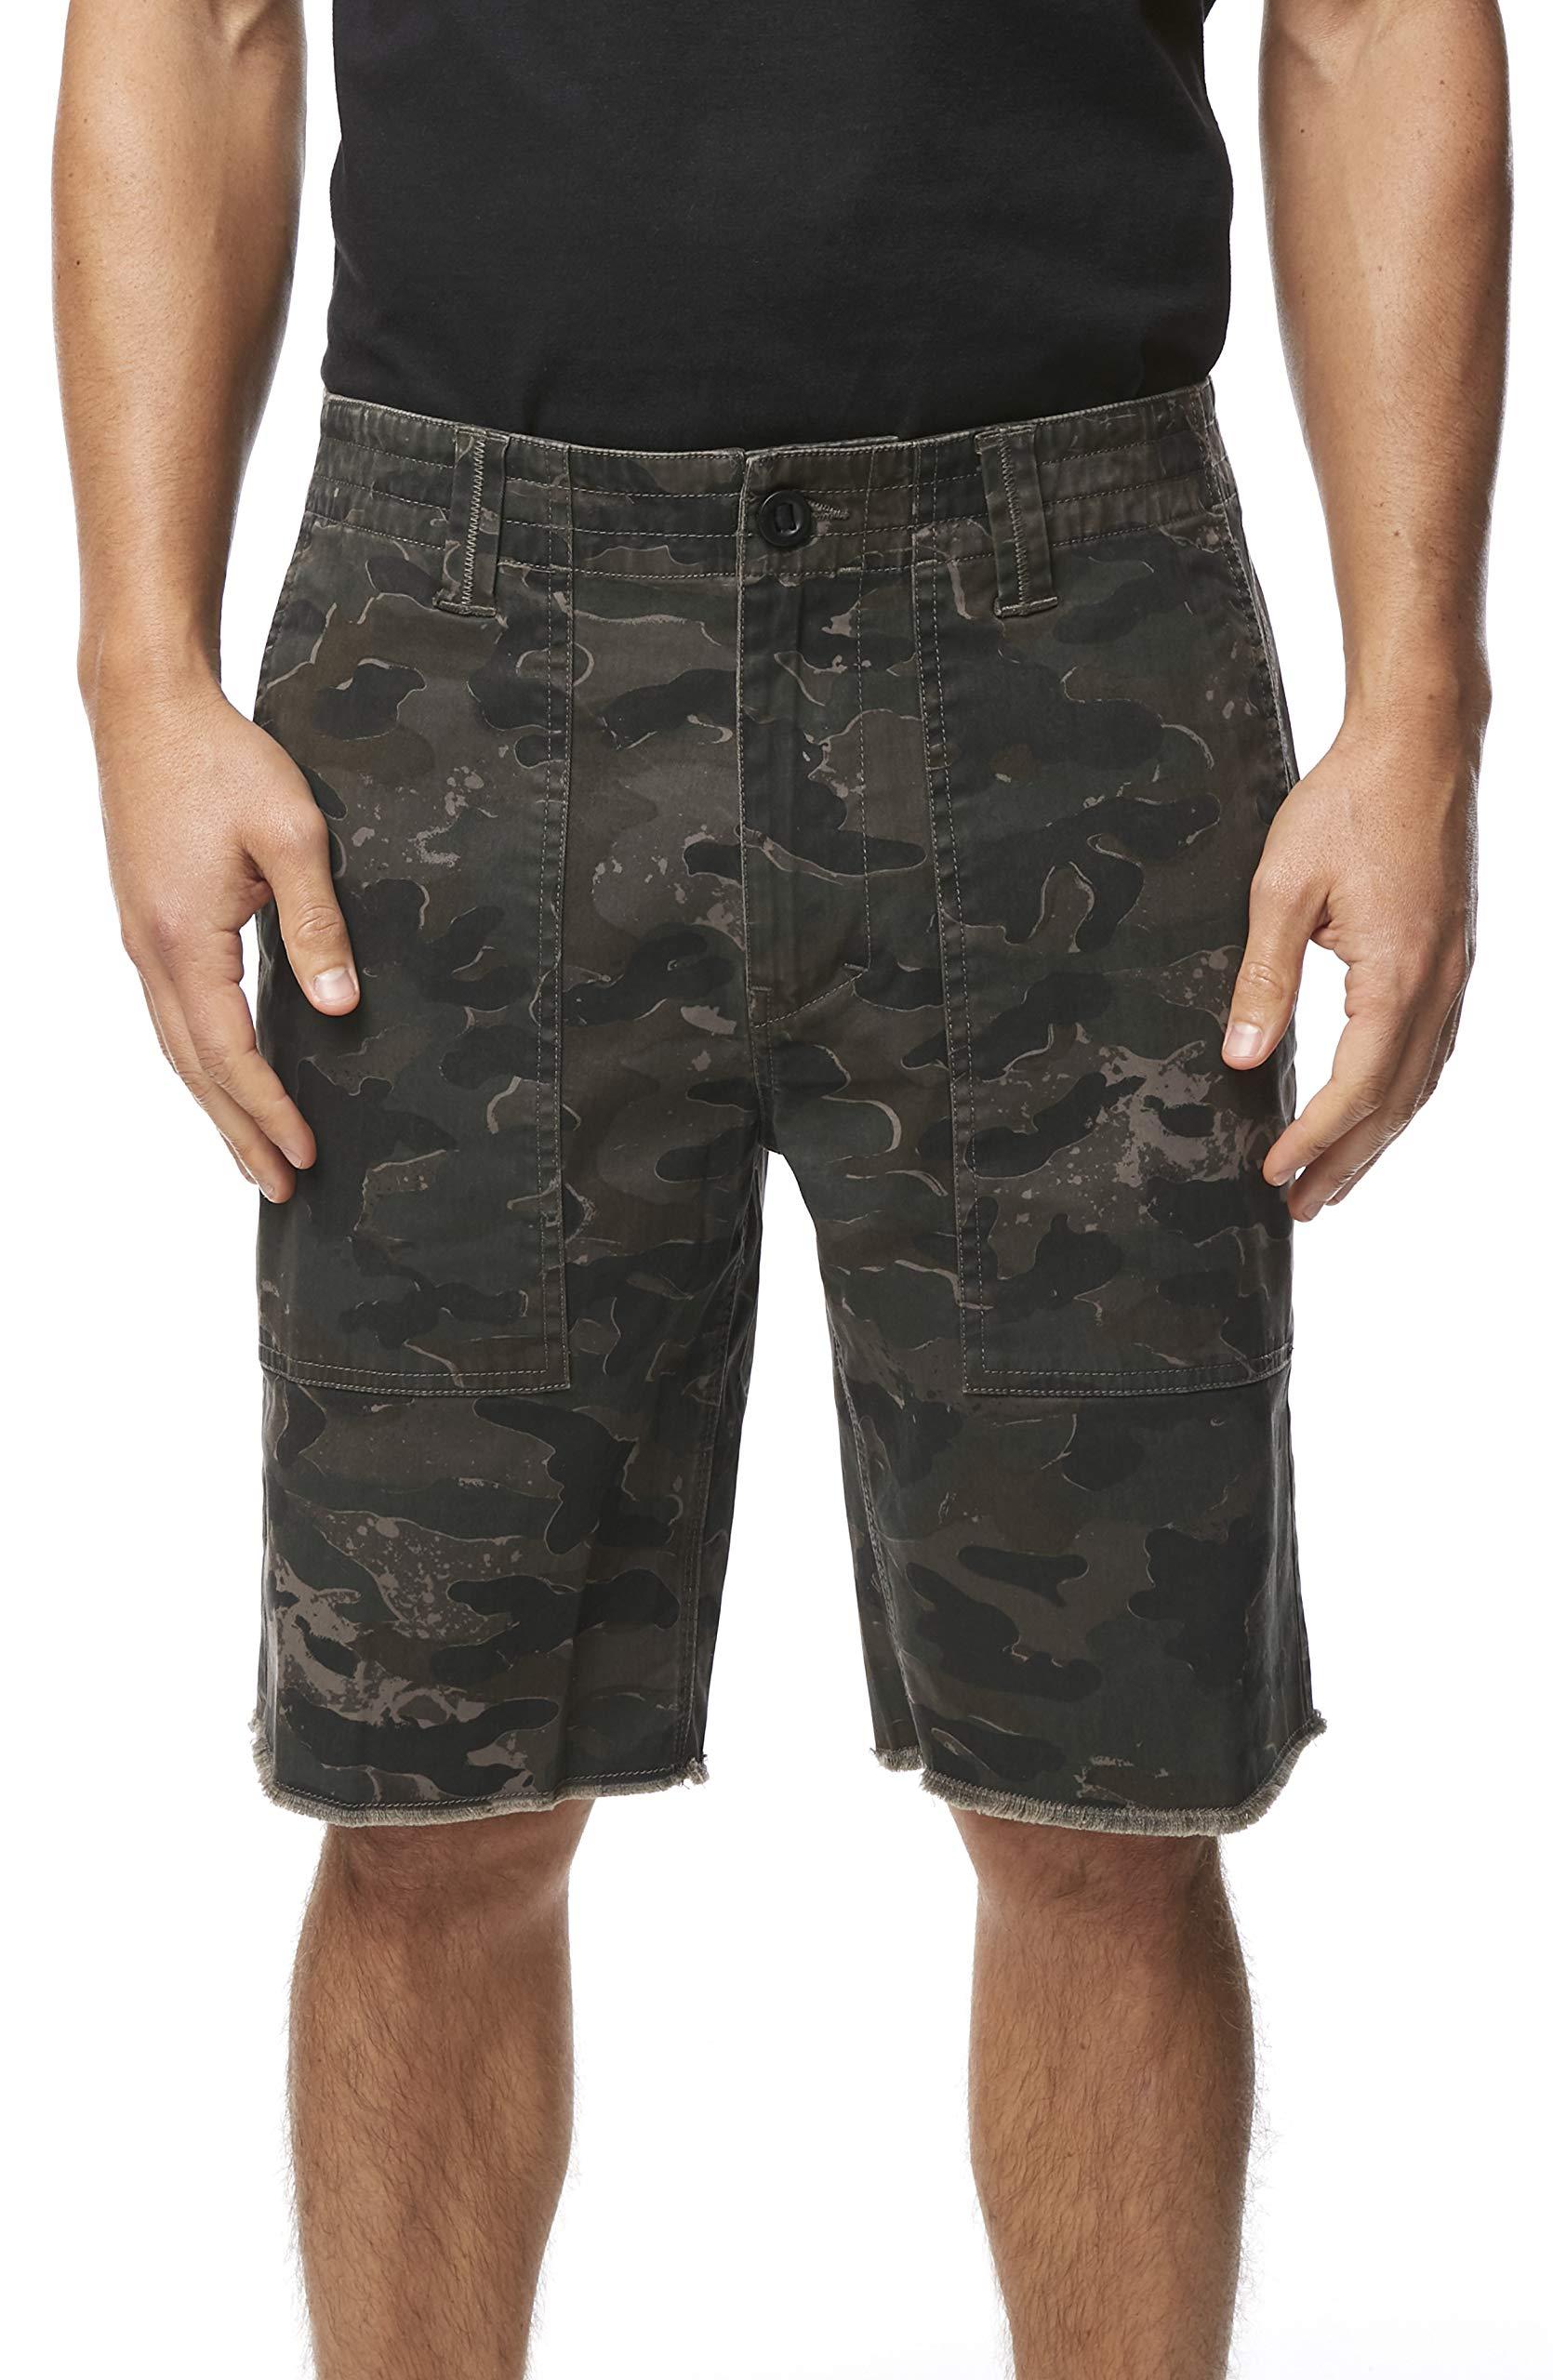 O'NEILL Men's Standard Fit Stretch Walk Short, 19 Inch Outseam